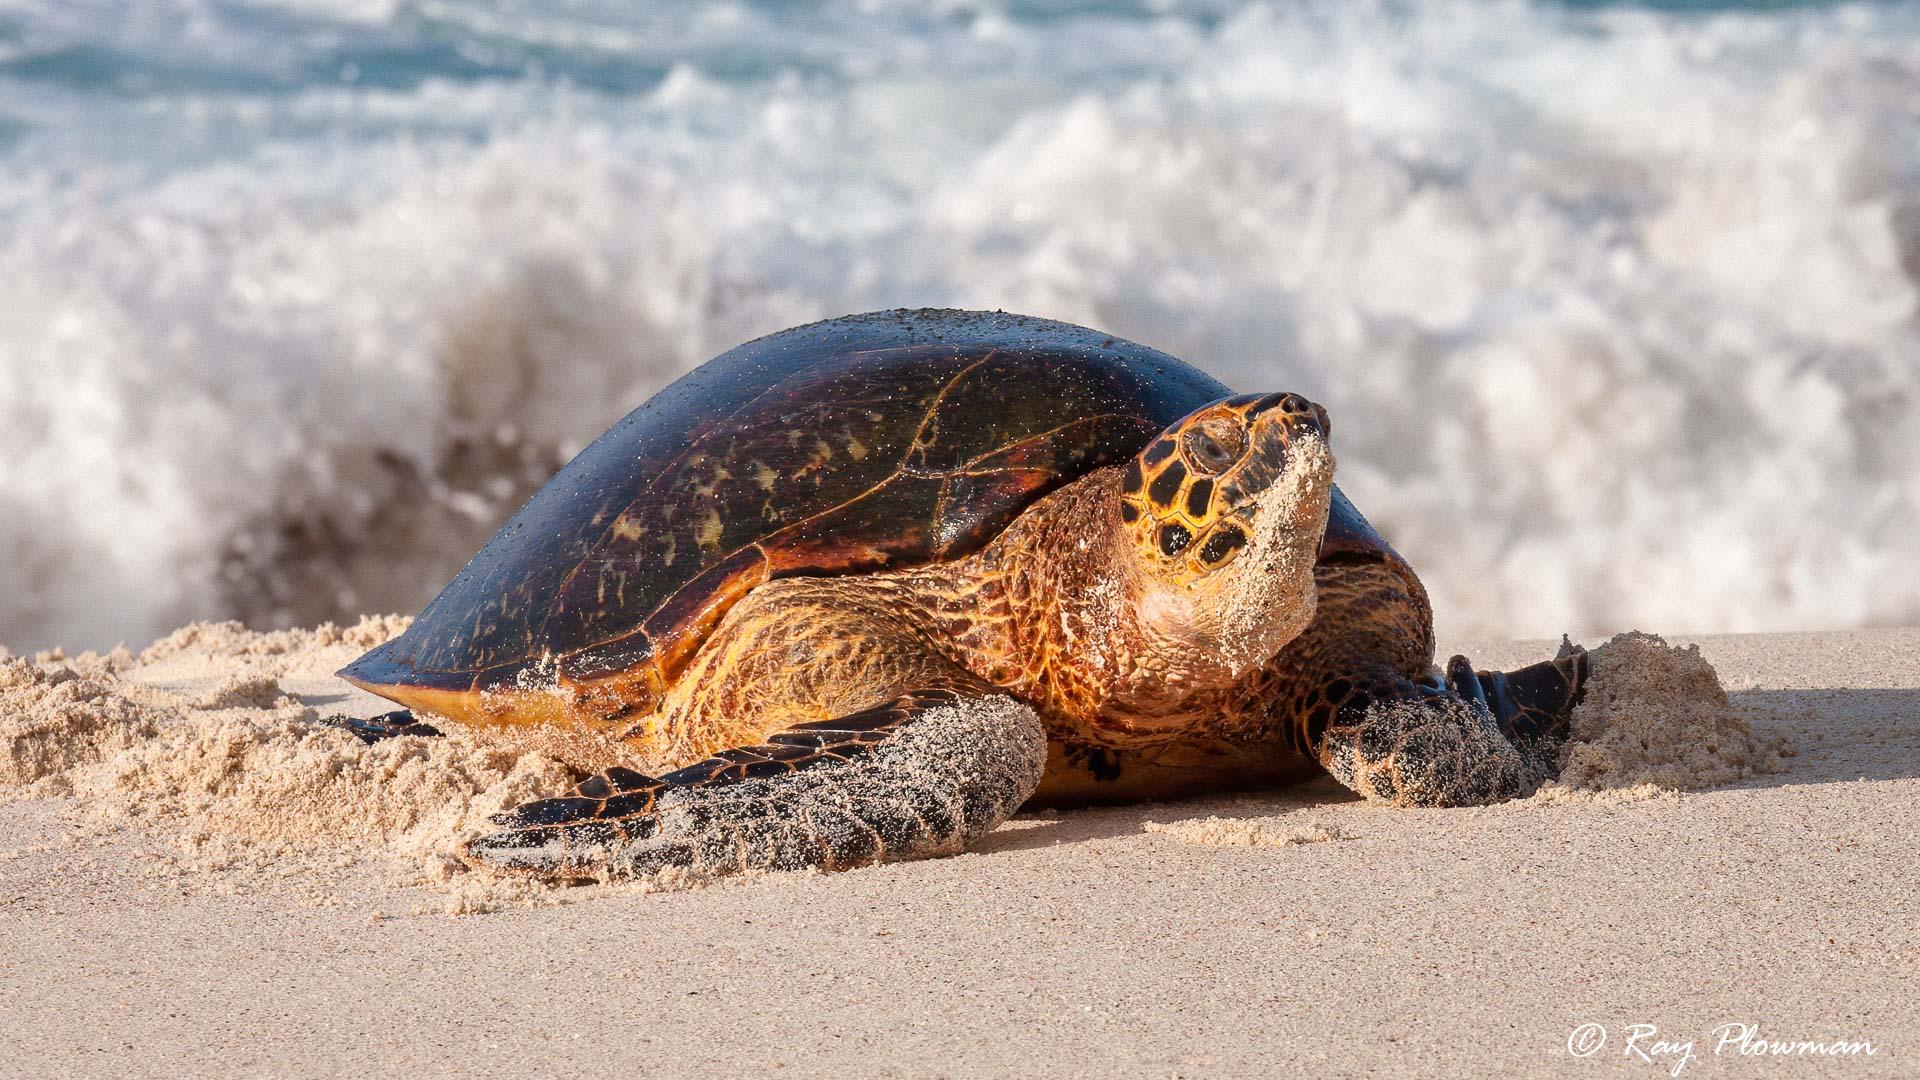 Hawksbill Turtle (Eretmochelys imbricata) coming ashore at Anse Bazarca beach in Seychelles